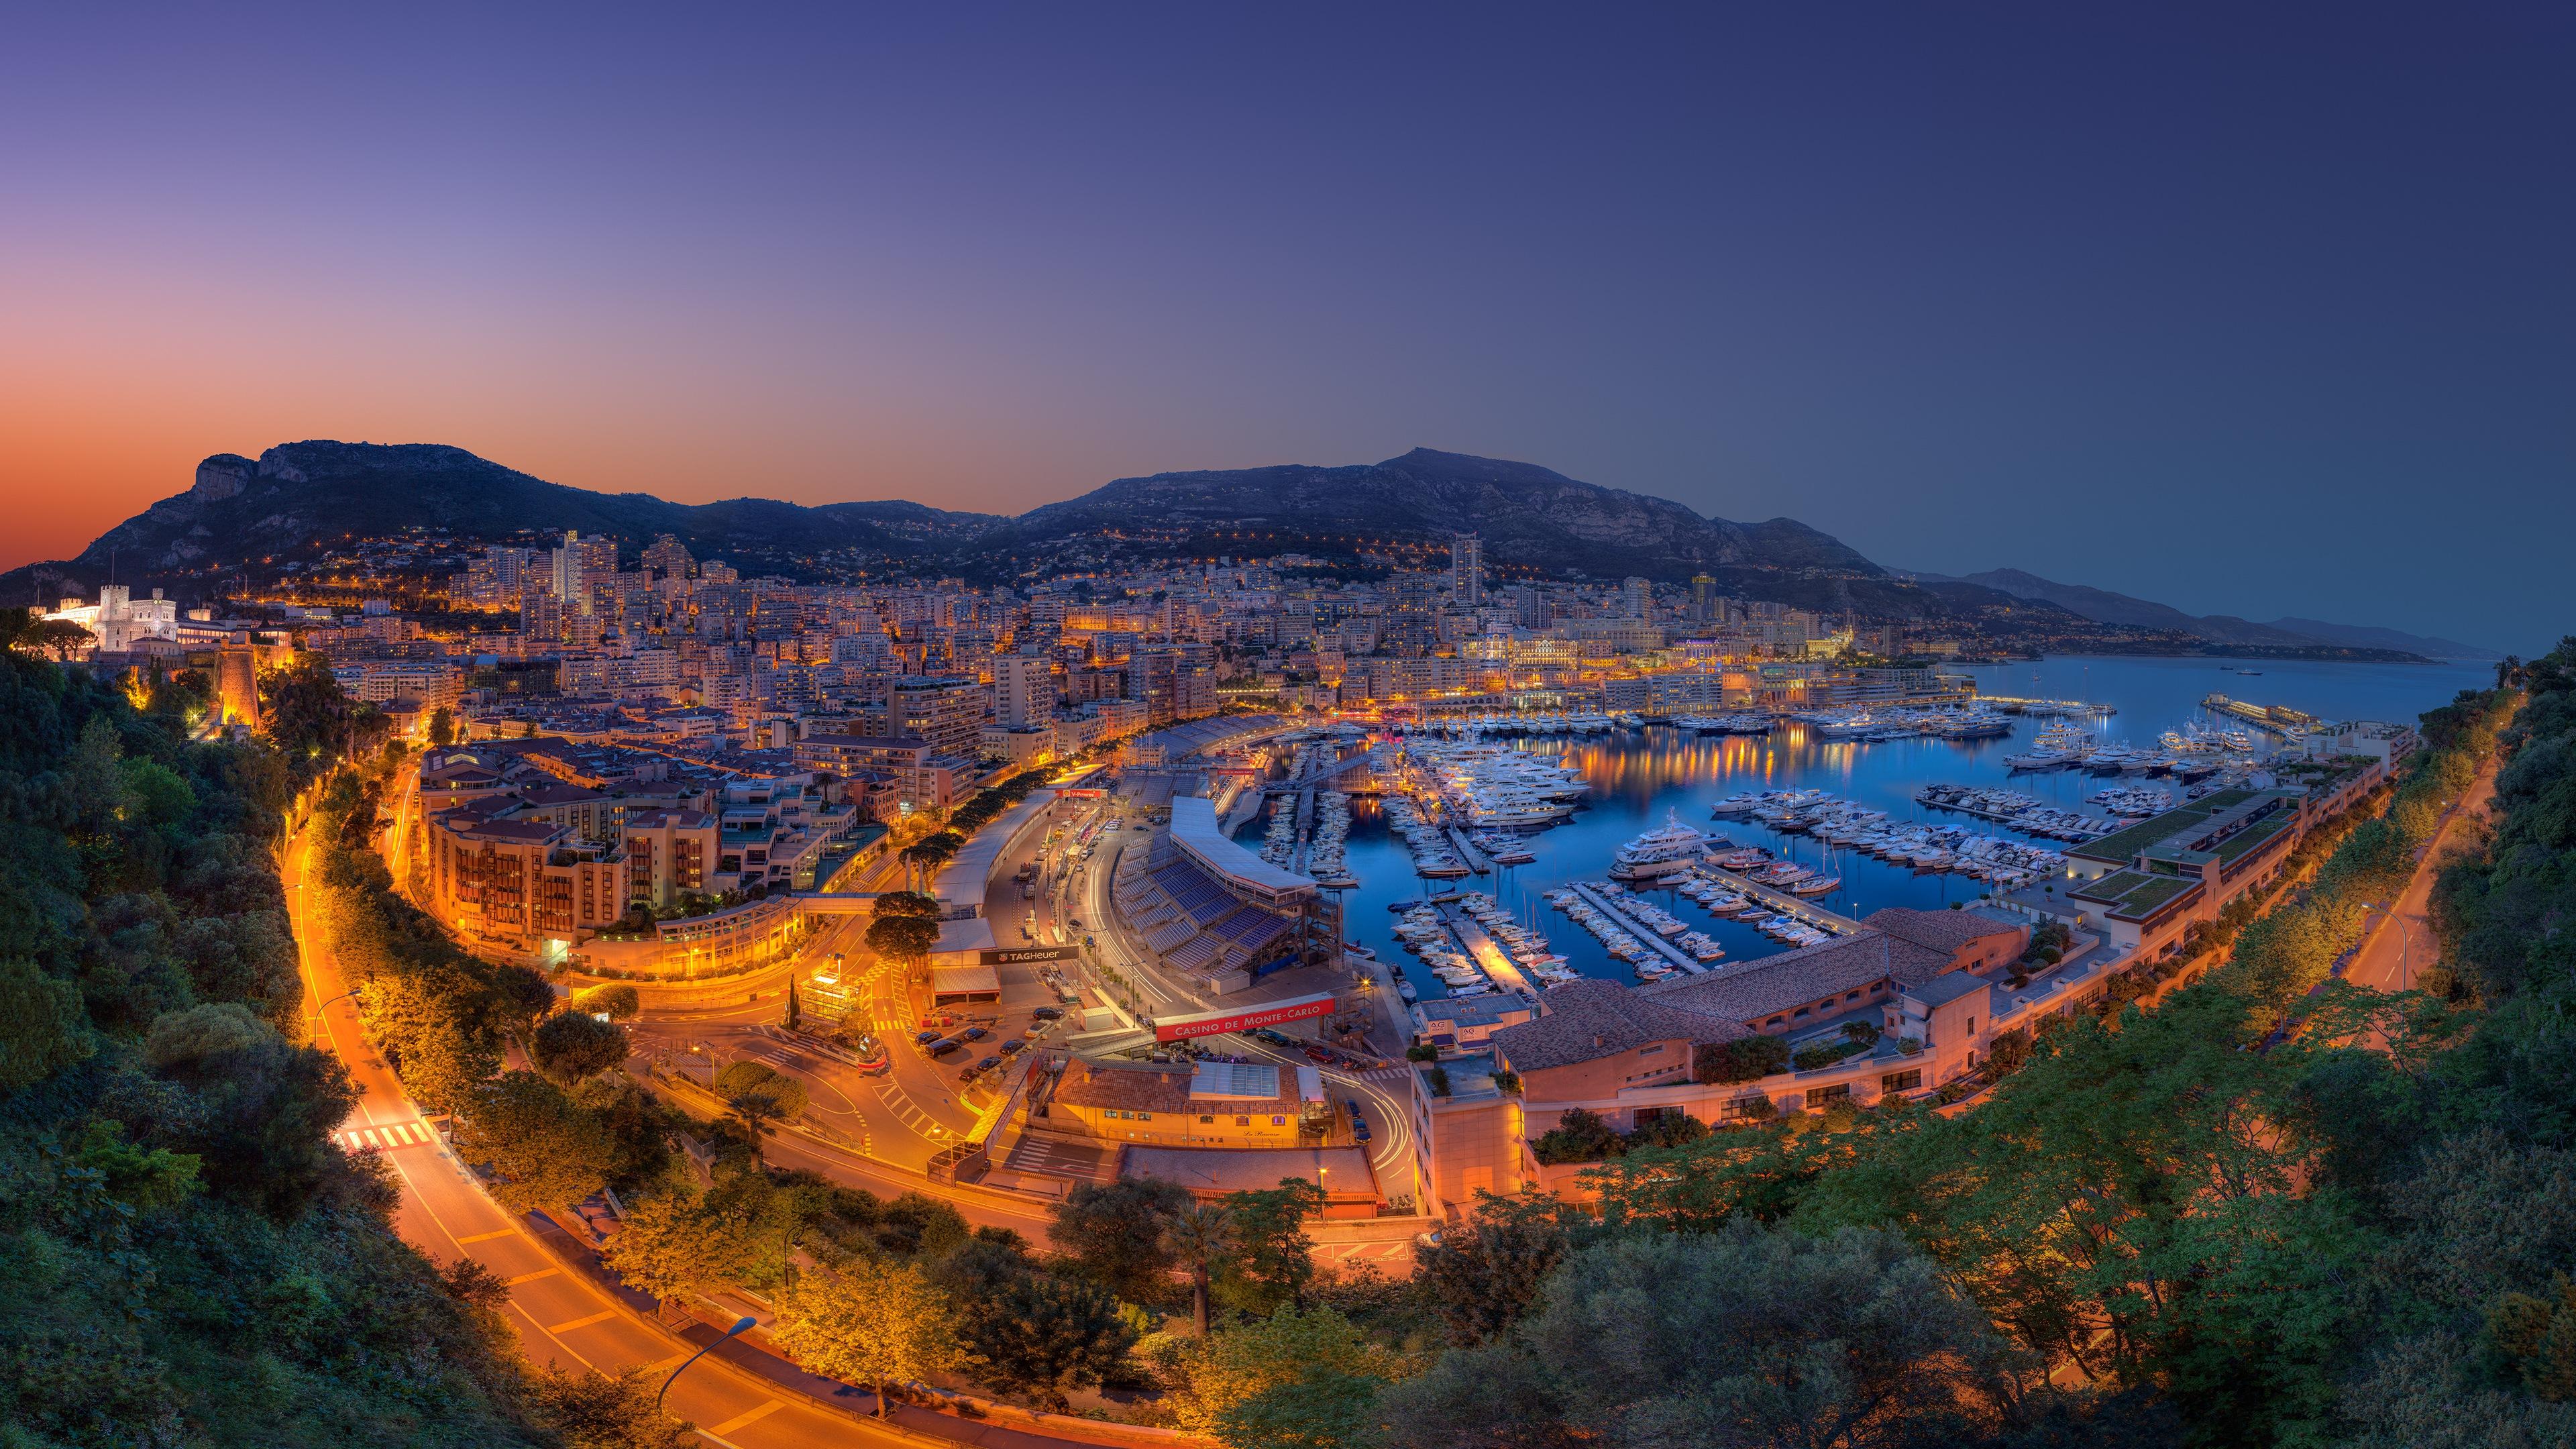 Monte Carlo Yachts Port Panorama 4K Ultra HD Desktop Wallpaper